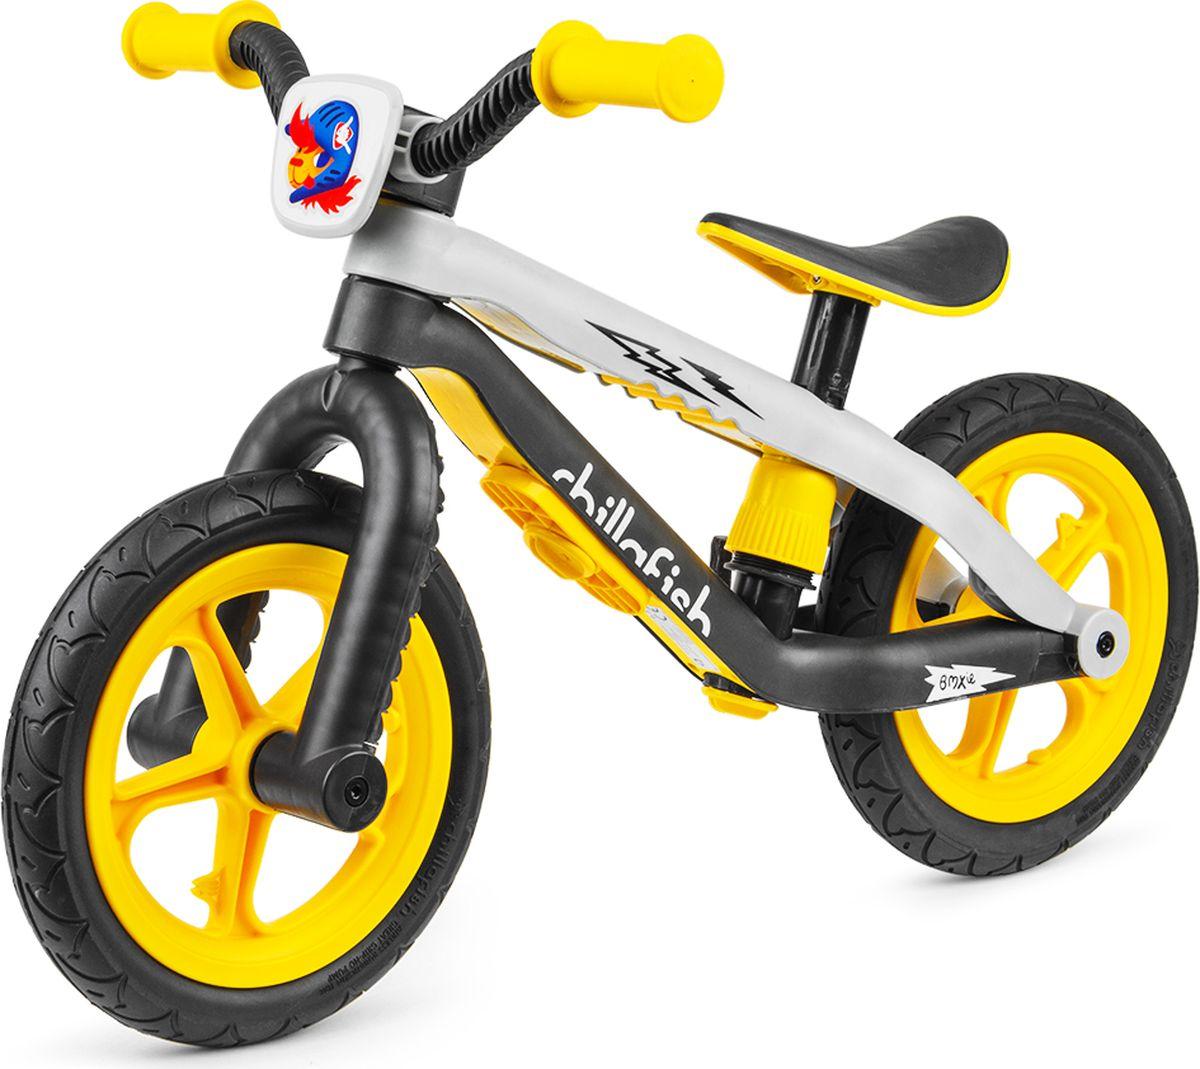 Chillafish Беговел детский BMXie-RS цвет желтый - Беговелы